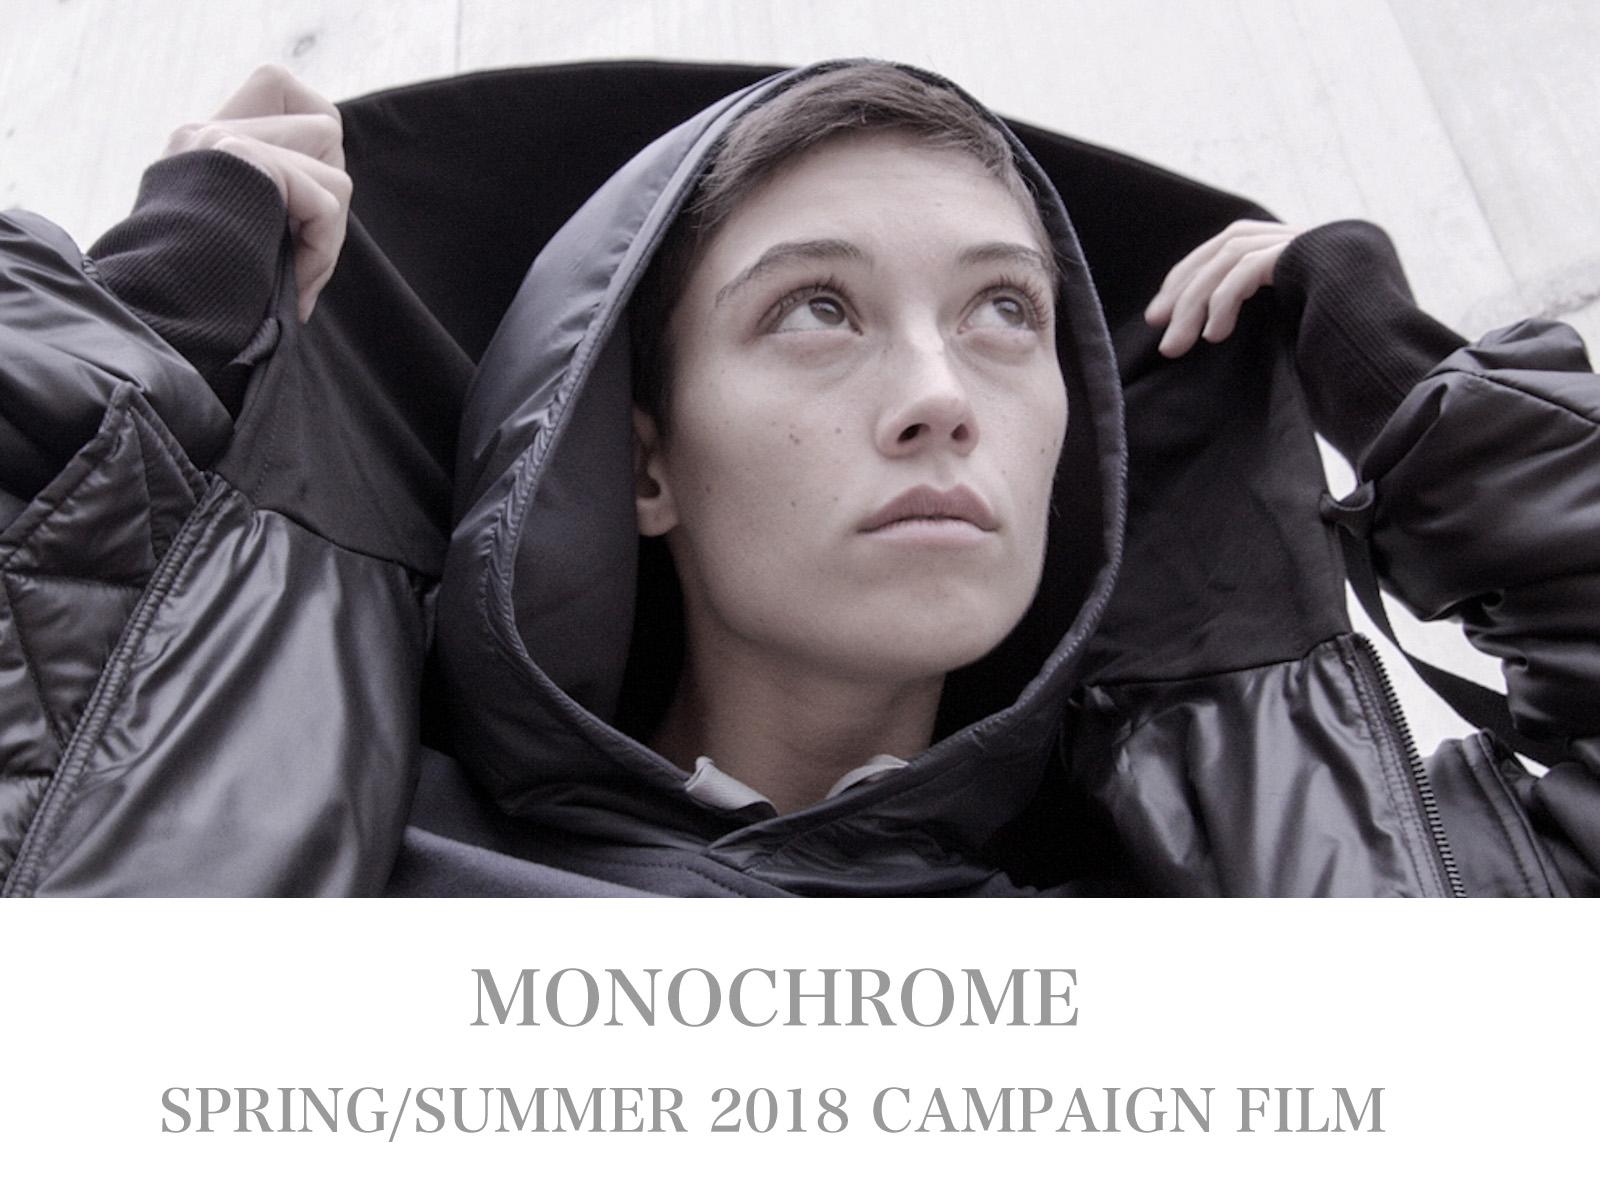 MONOCHROME – SPRING SUMMER 2018 VIDEO CAMPAIGN